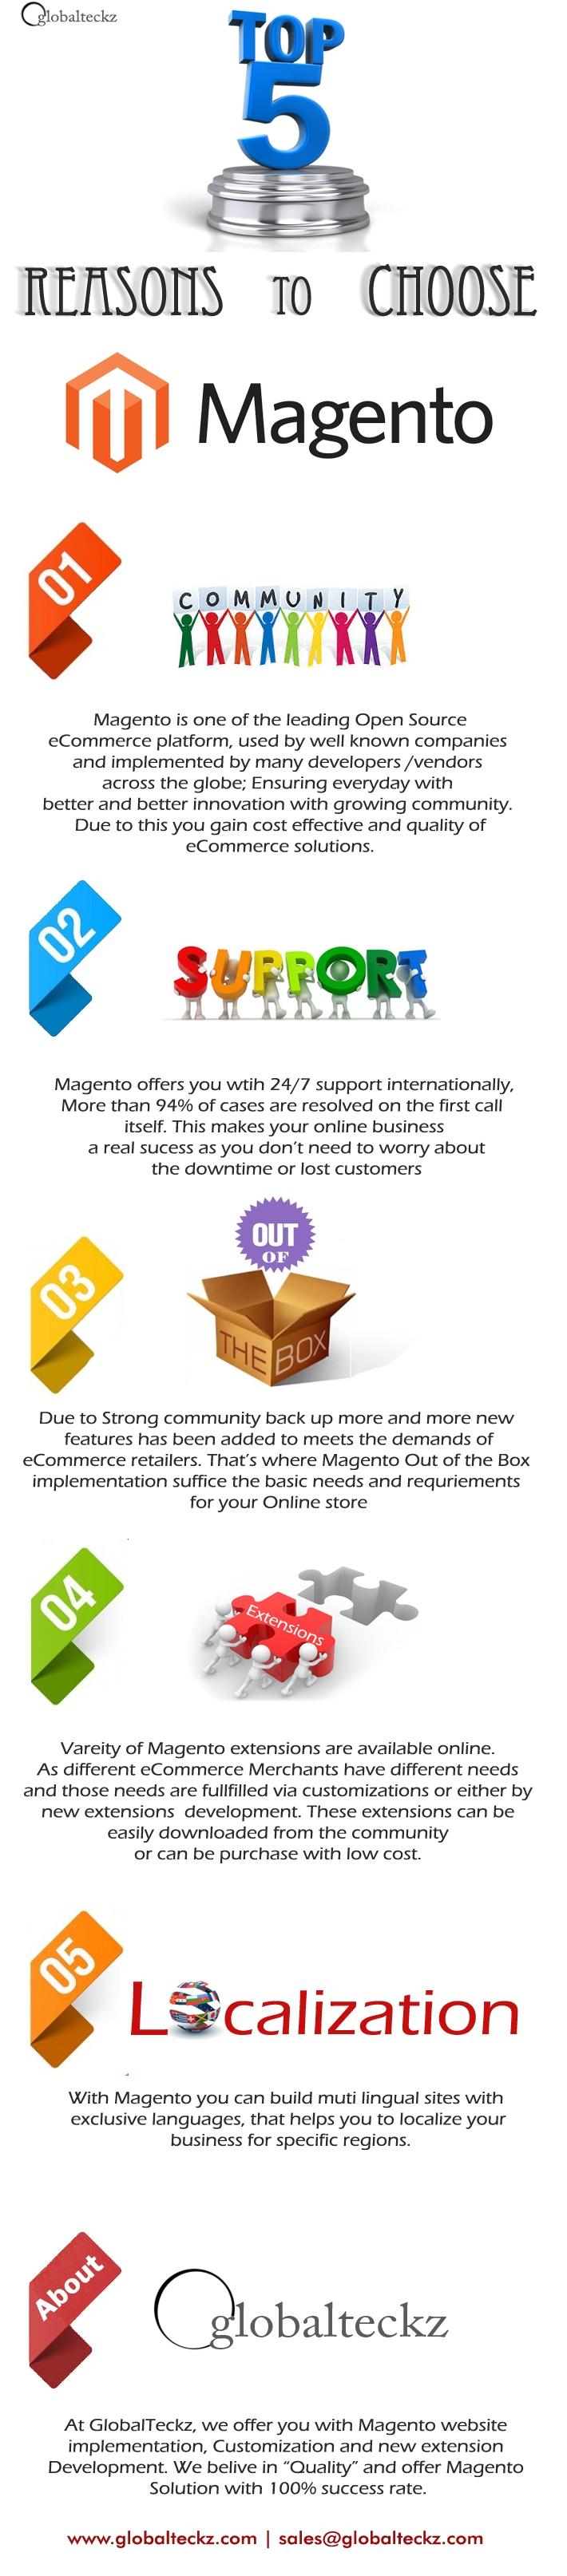 magento website, magento websites, infographics, why company use magento, magento cms, TOP 5 REASON TO CHOOSE MAGENTO